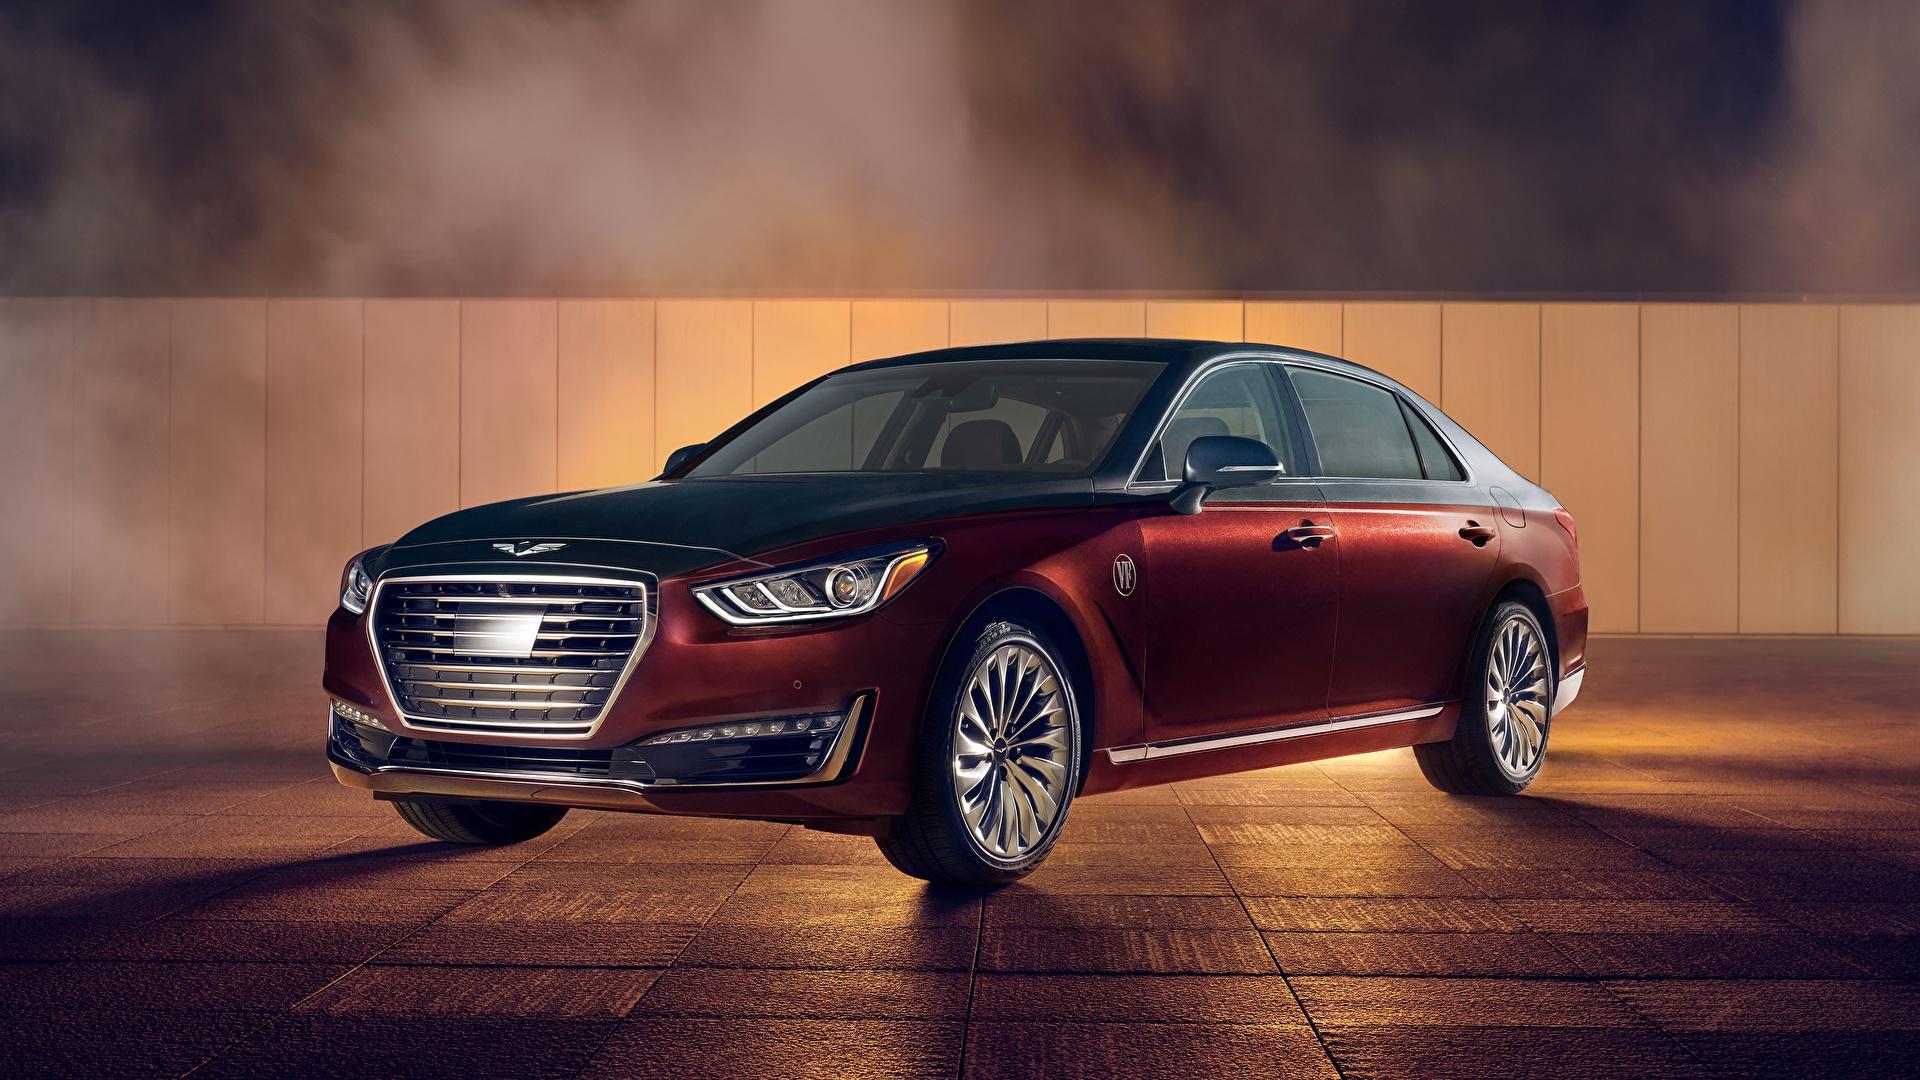 Фотографии Hyundai Genesis G90, Vanity Fair, Special Edition, US-spec, 2018 Седан авто Металлик 1920x1080 Хендай машина машины Автомобили автомобиль